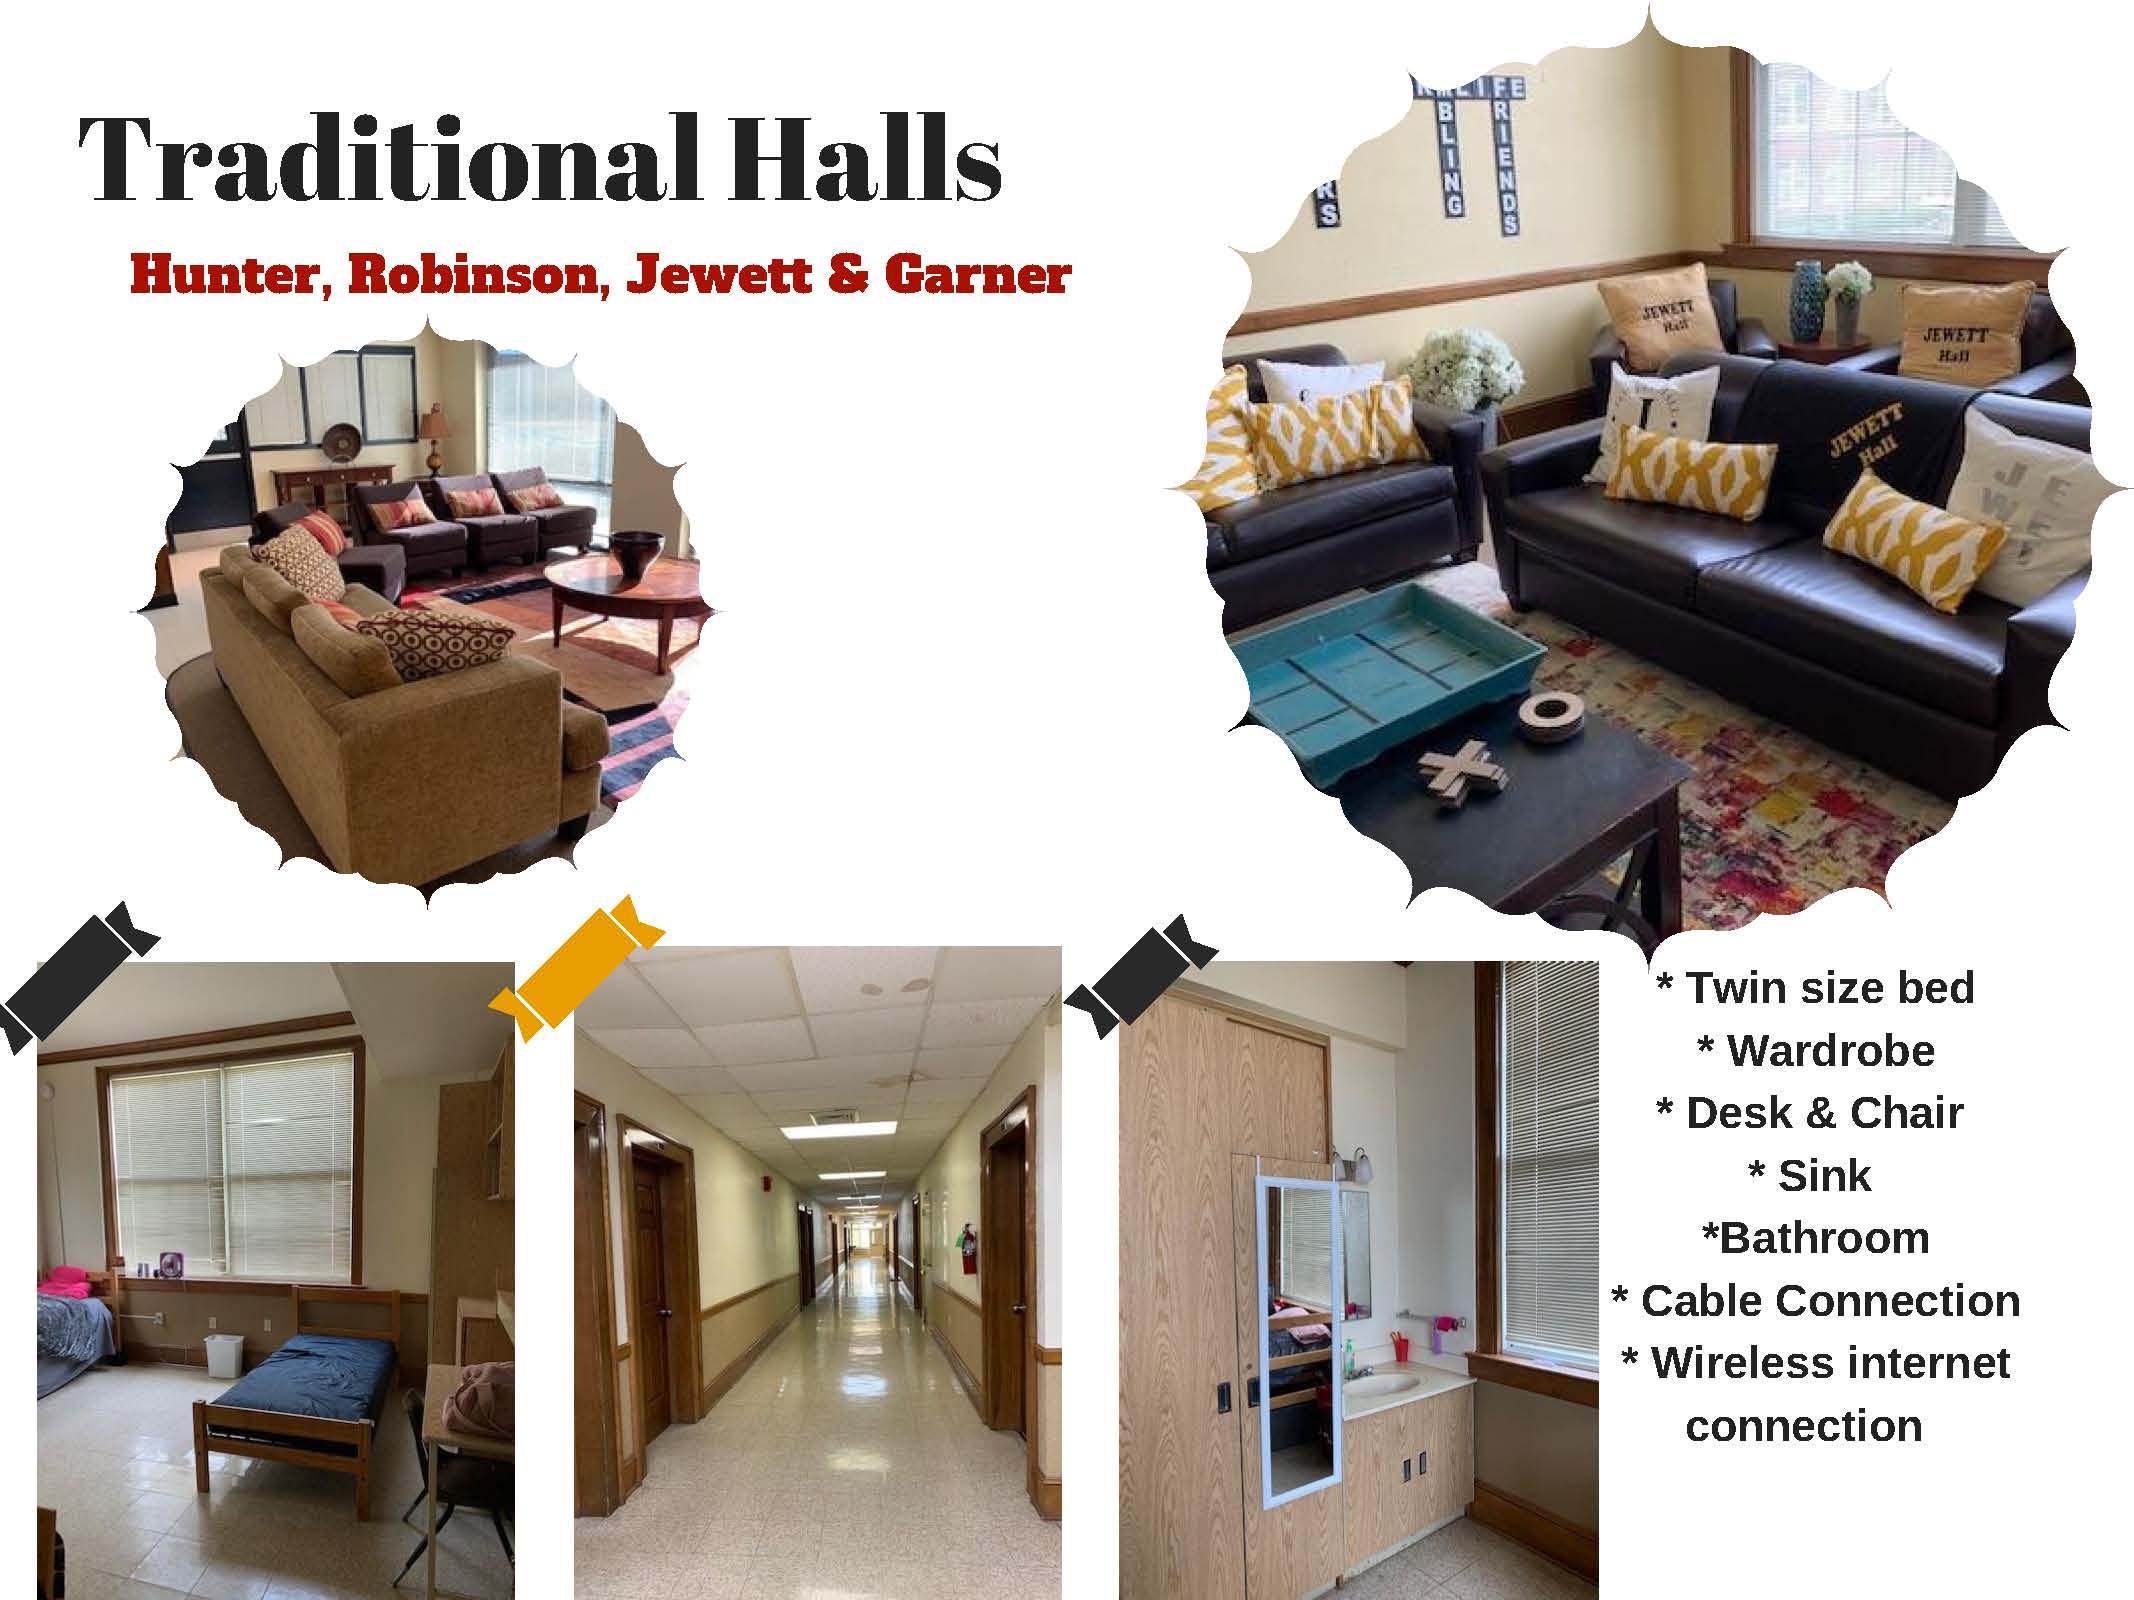 Traditional Halls - Hunter, Robinson, Jewett & Garner